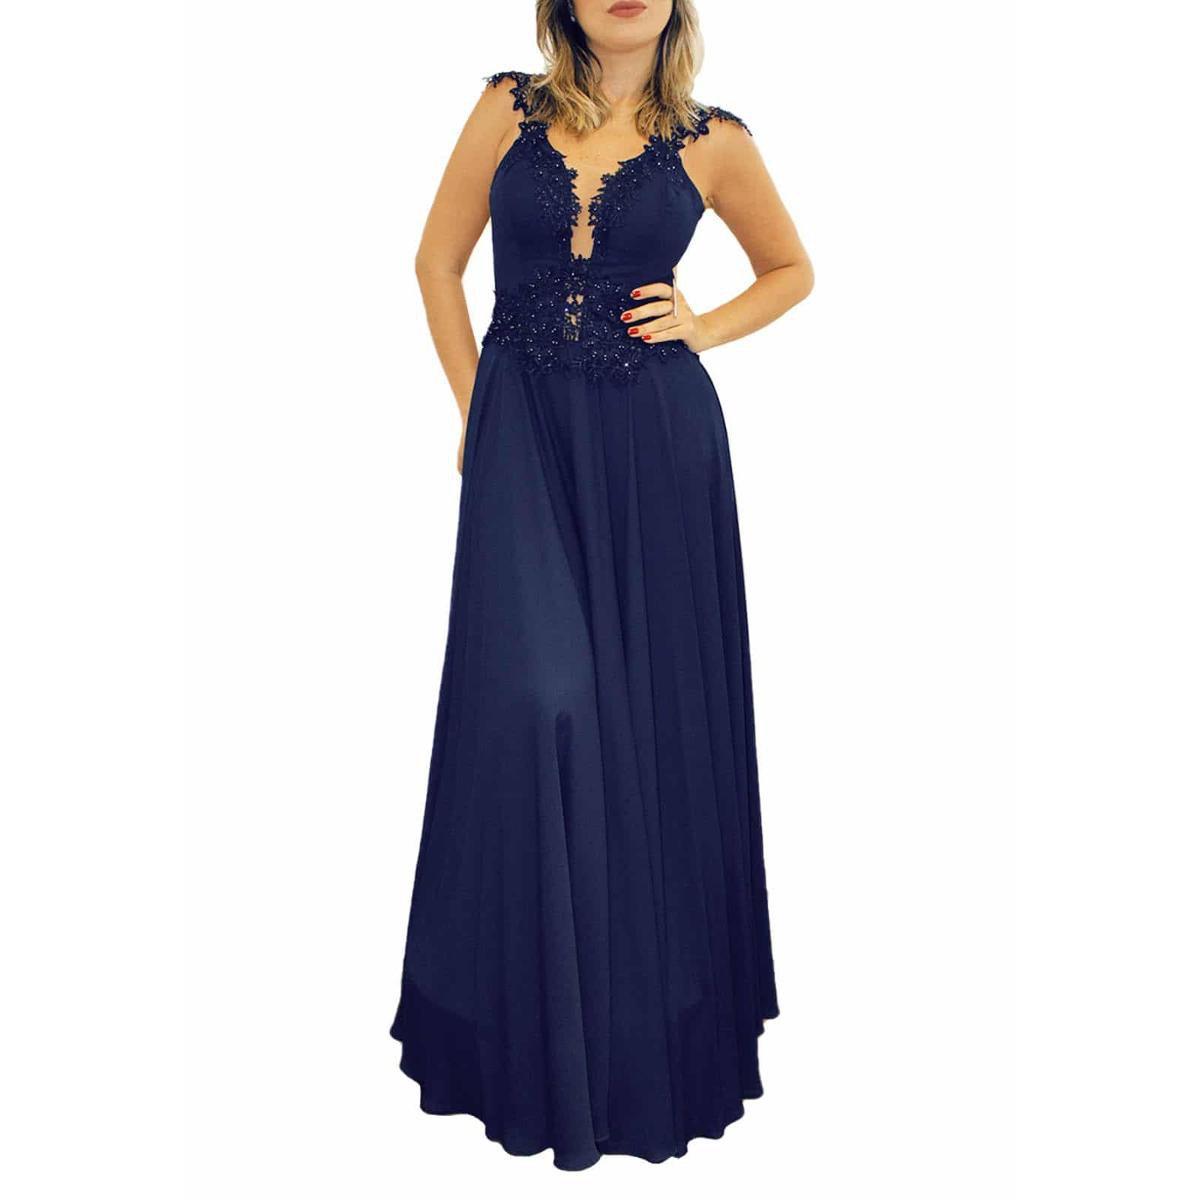 Vestido De Festa Sob Longo Com Tule Bordado Feminino Azul Escuro